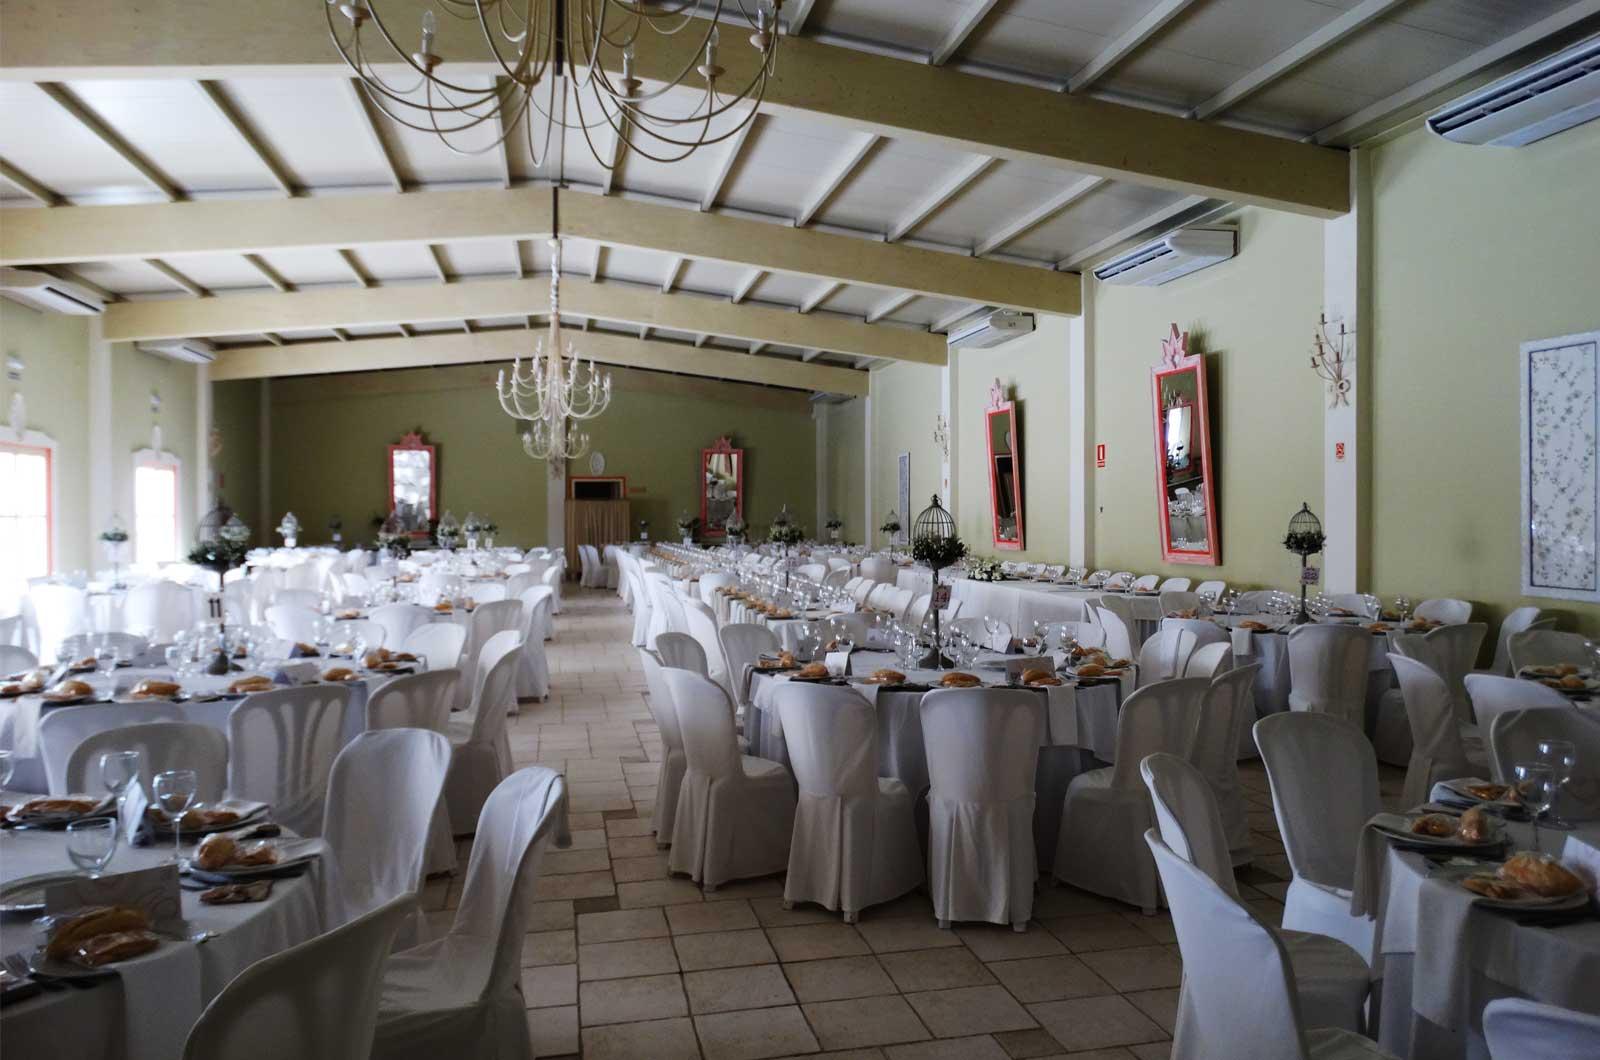 Hacienda La Boticaria - salón<div style='clear:both;width:100%;height:0px;'></div><span class='cat'>Hacienda La Boticaria</span><div style='clear:both;width:100%;height:0px;'></div><span class='desc'>Hacienda La Boticaria - salón</span>